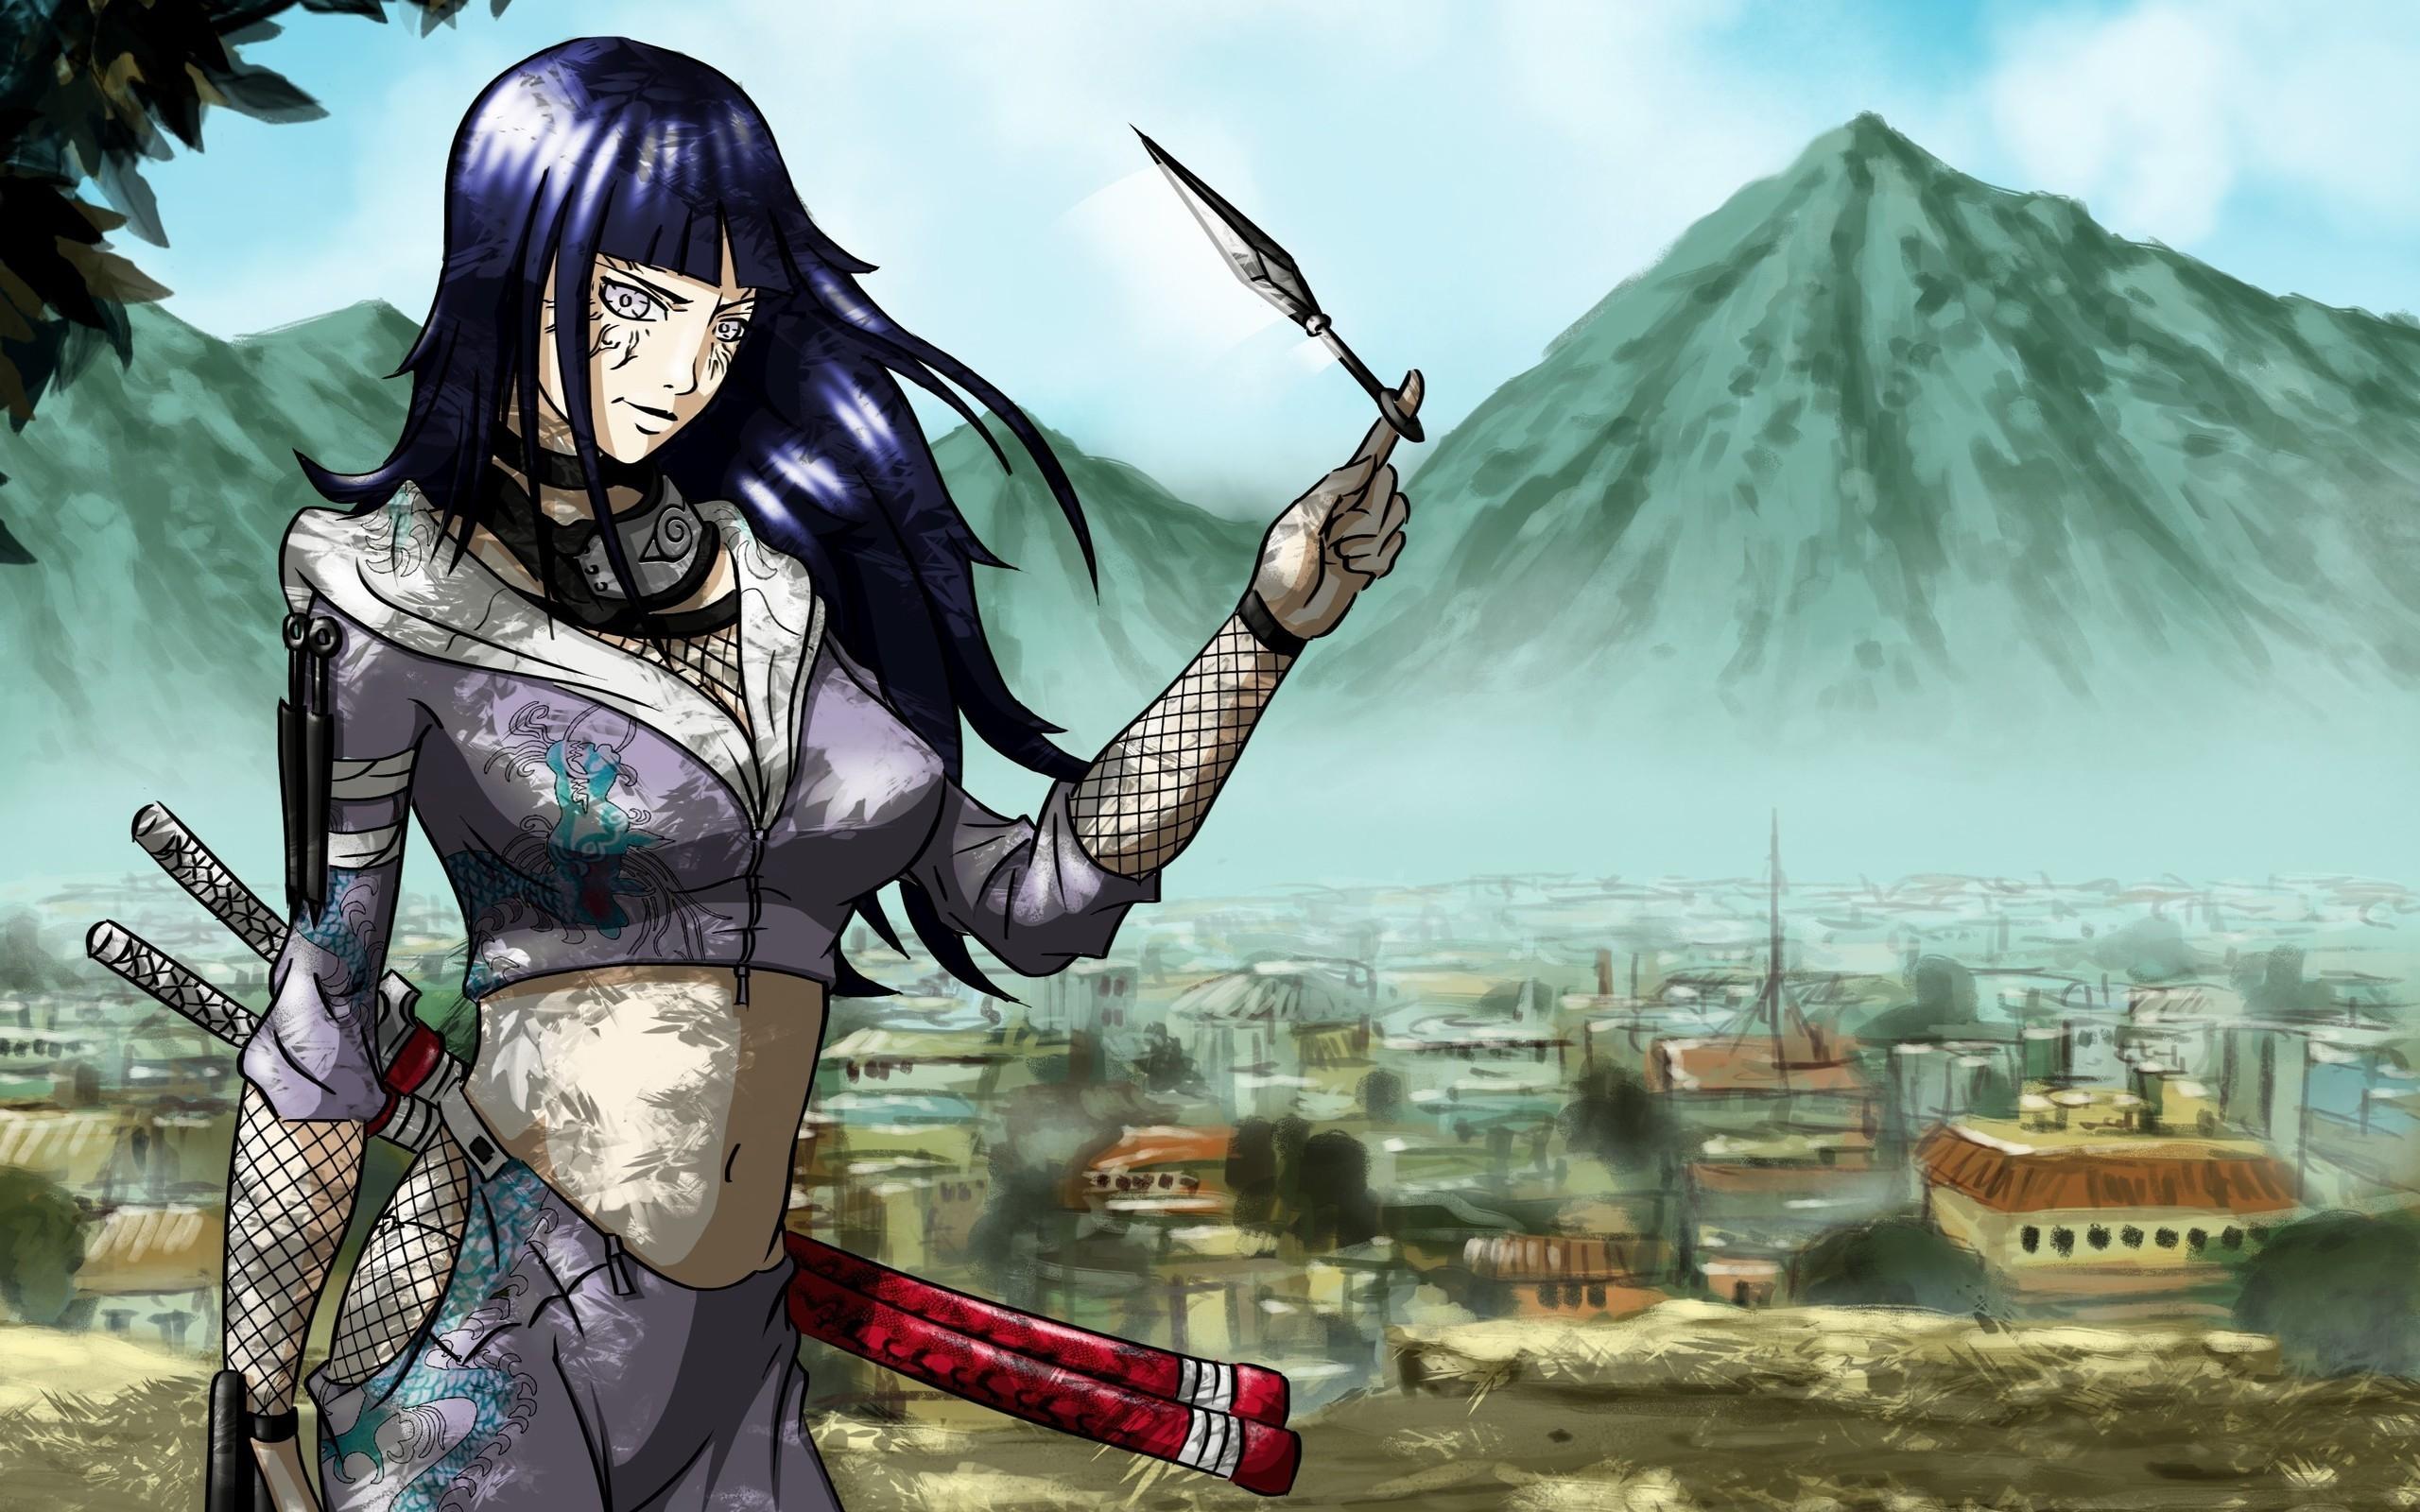 Simple Wallpaper Naruto Shippuden - naruto-naruto-shippuden-hinata-hyuga-fighter-weapons-mountains-city-1053753  Pictures.jpg